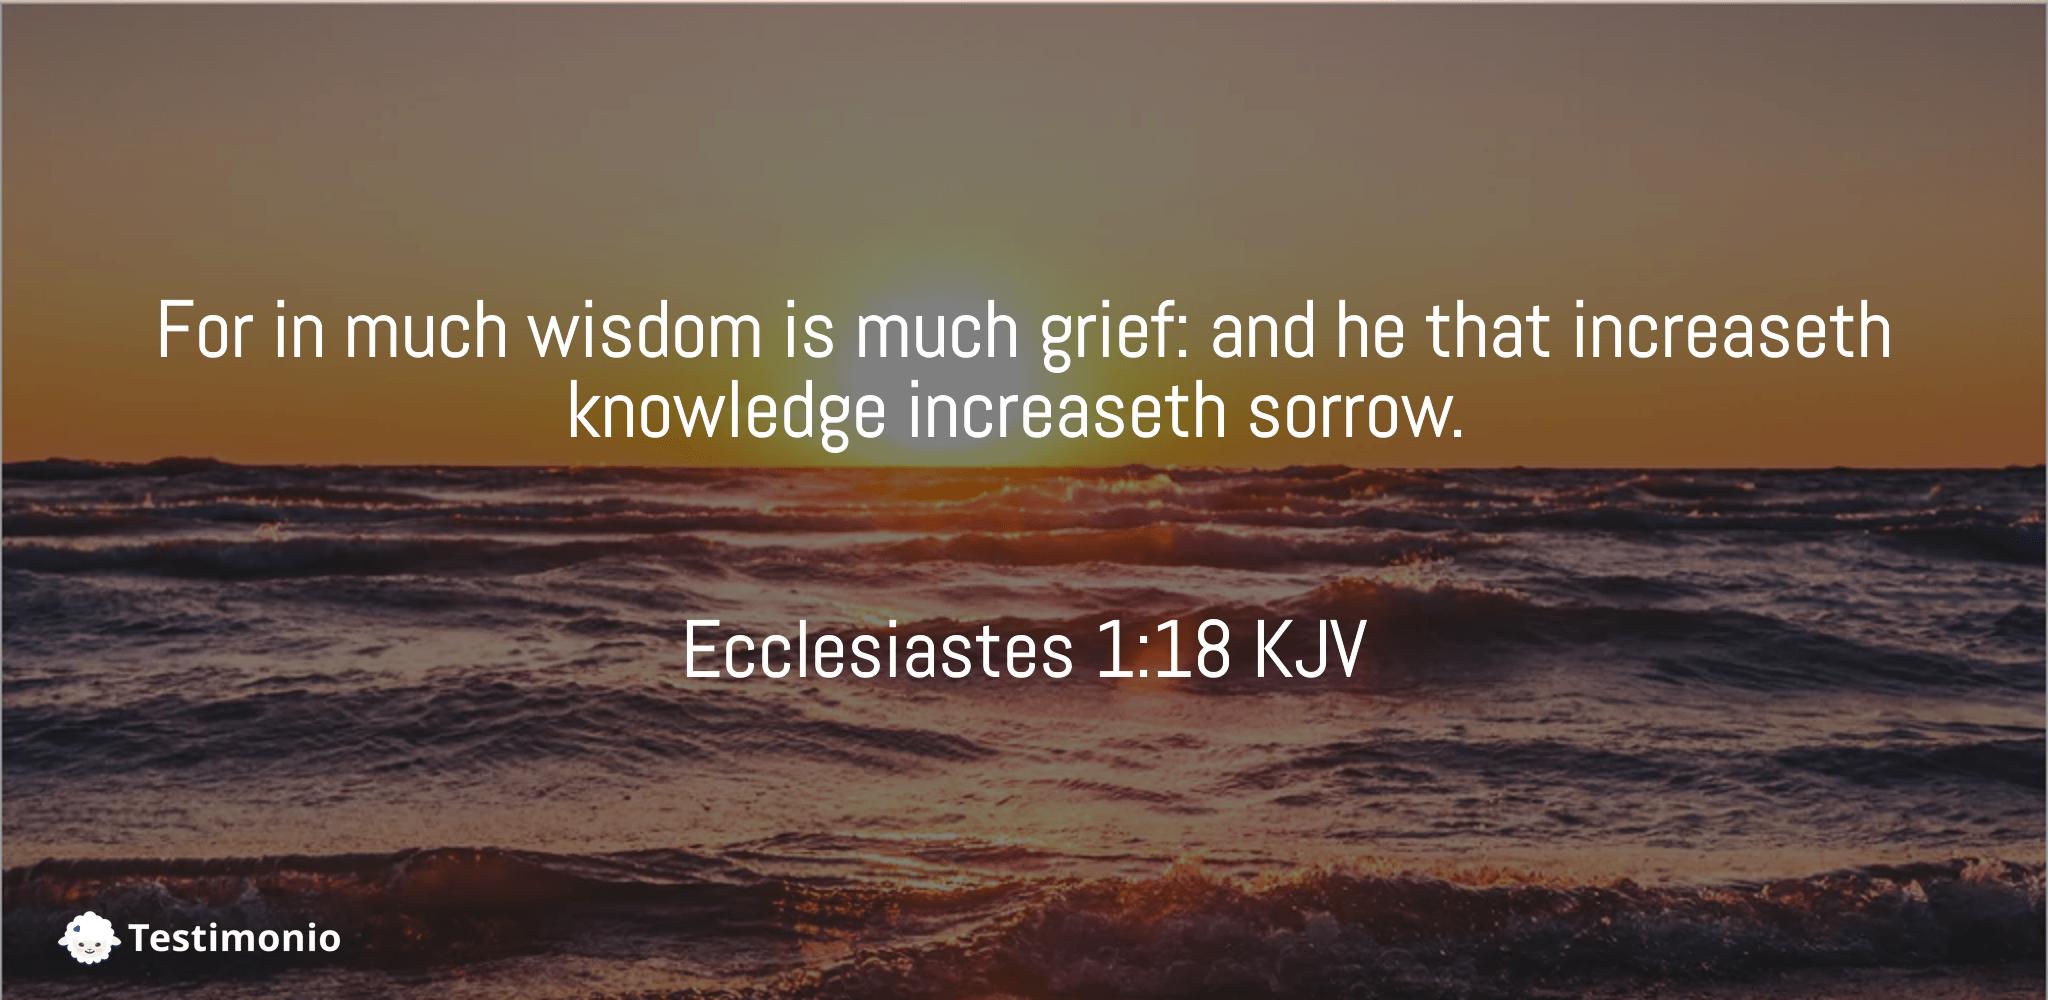 Ecclesiastes 1:18